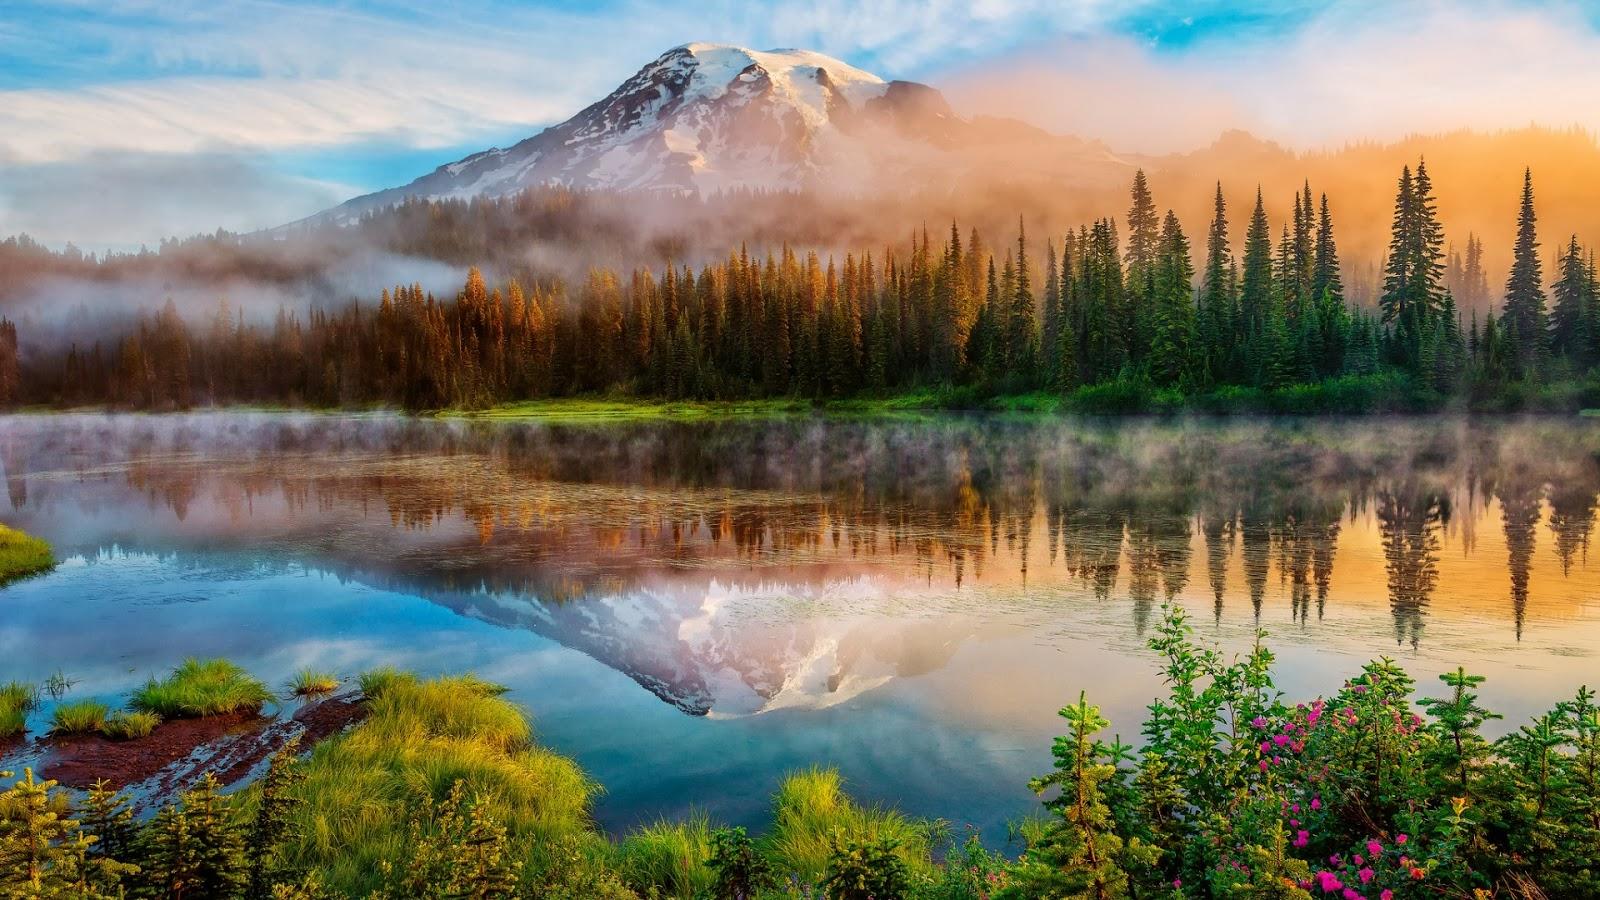 169 Beautiful Places on Earth Mount Rainier Landscape Wallpaper 1600x900